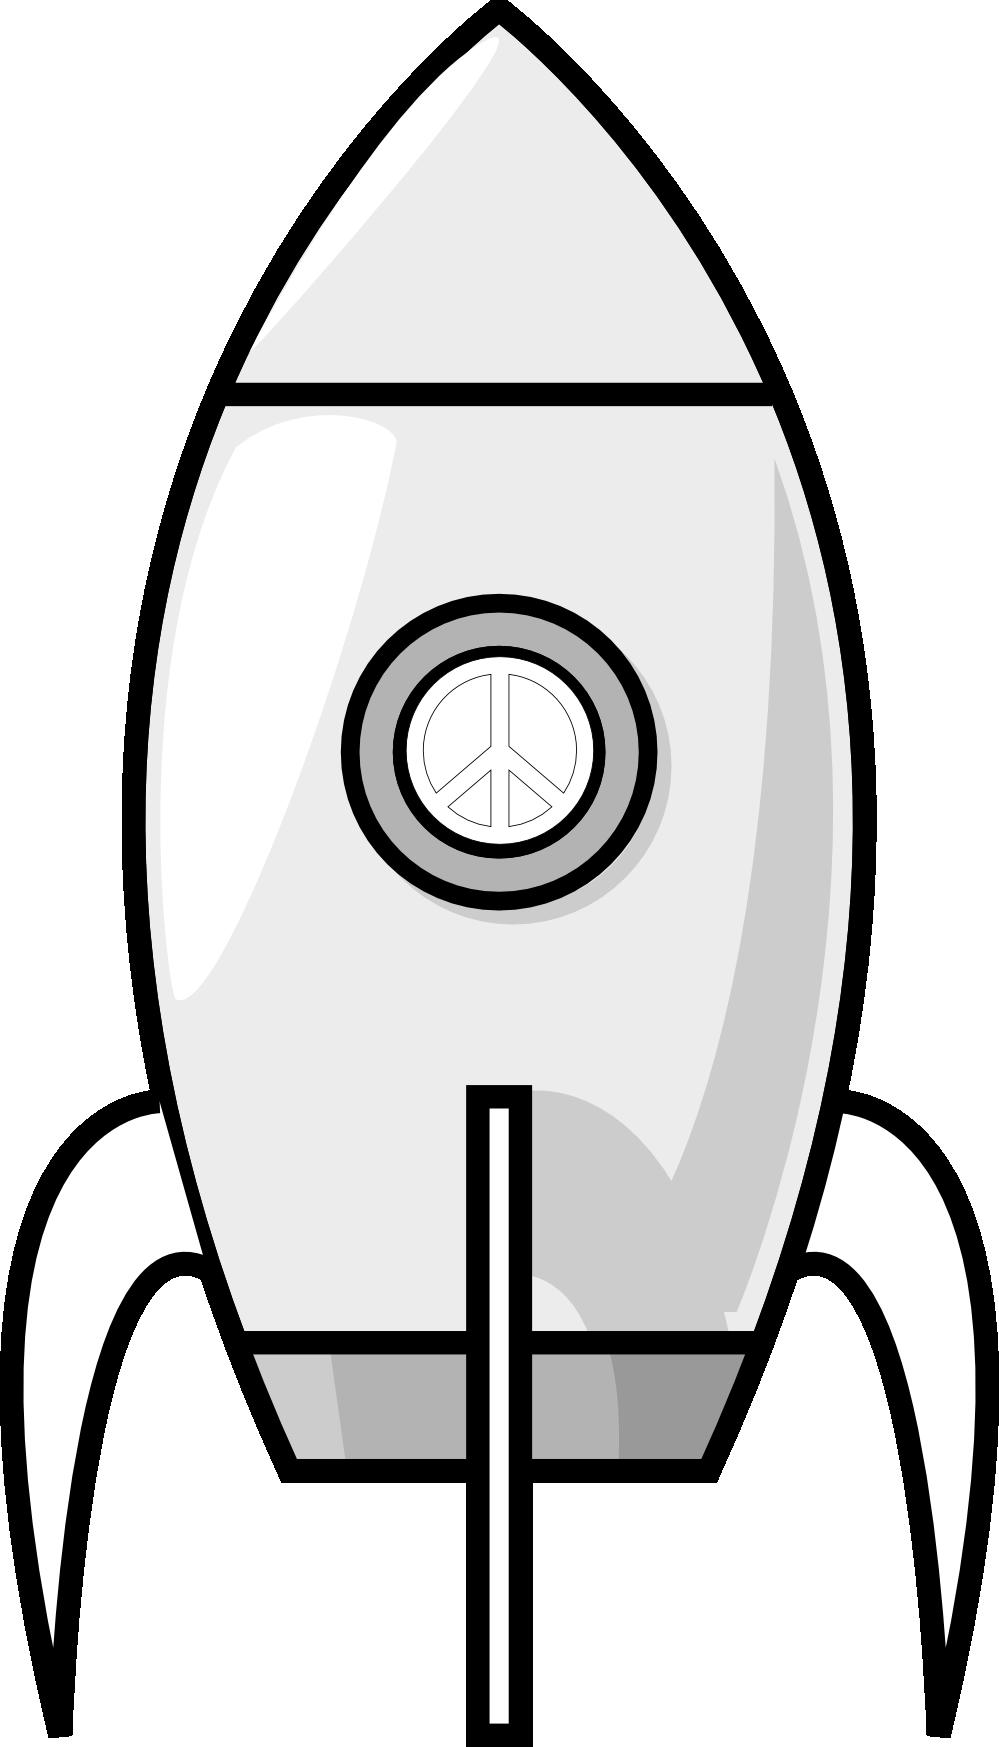 Electronics clipart drawing. A moon rocket black